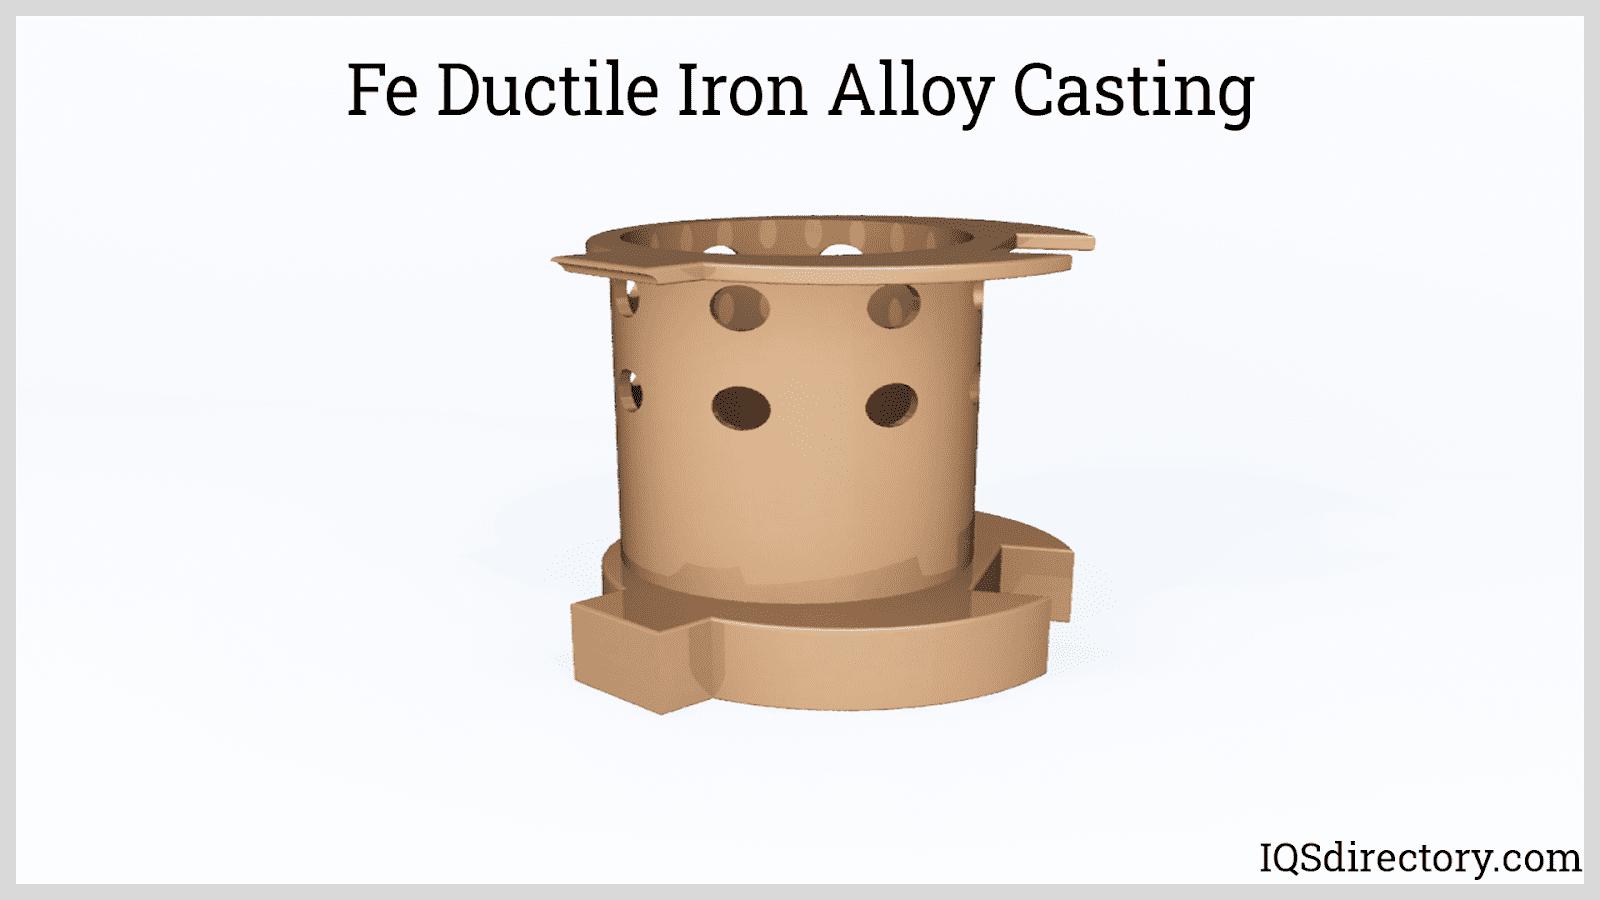 Fe Ductile Iron Alloy Casting